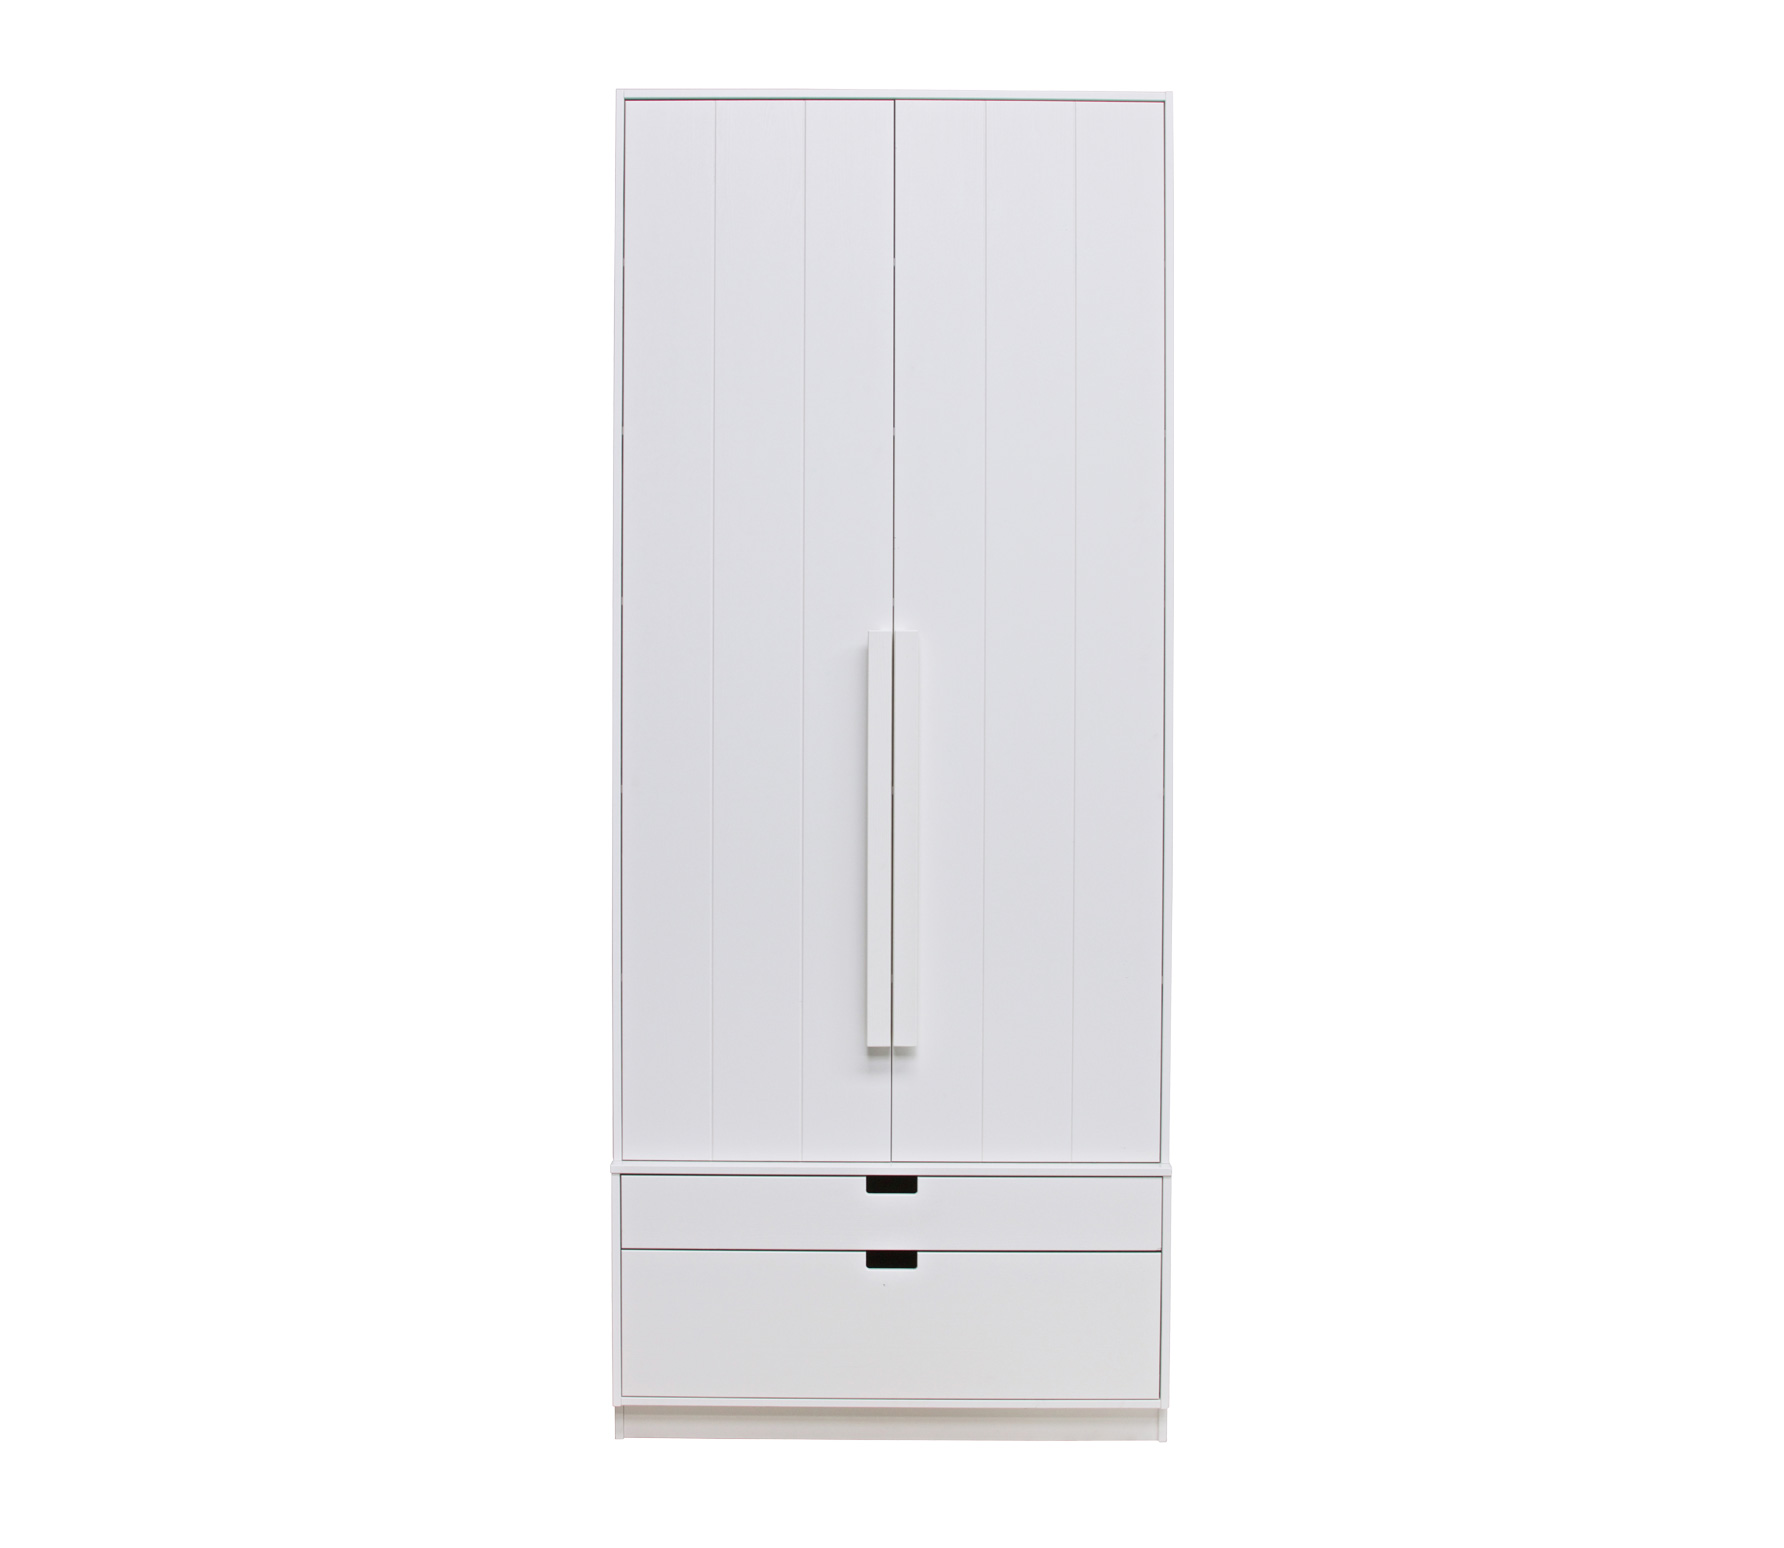 Basiclabel SKIK kast variant 20 wit 231x95x62 cm massief grenen